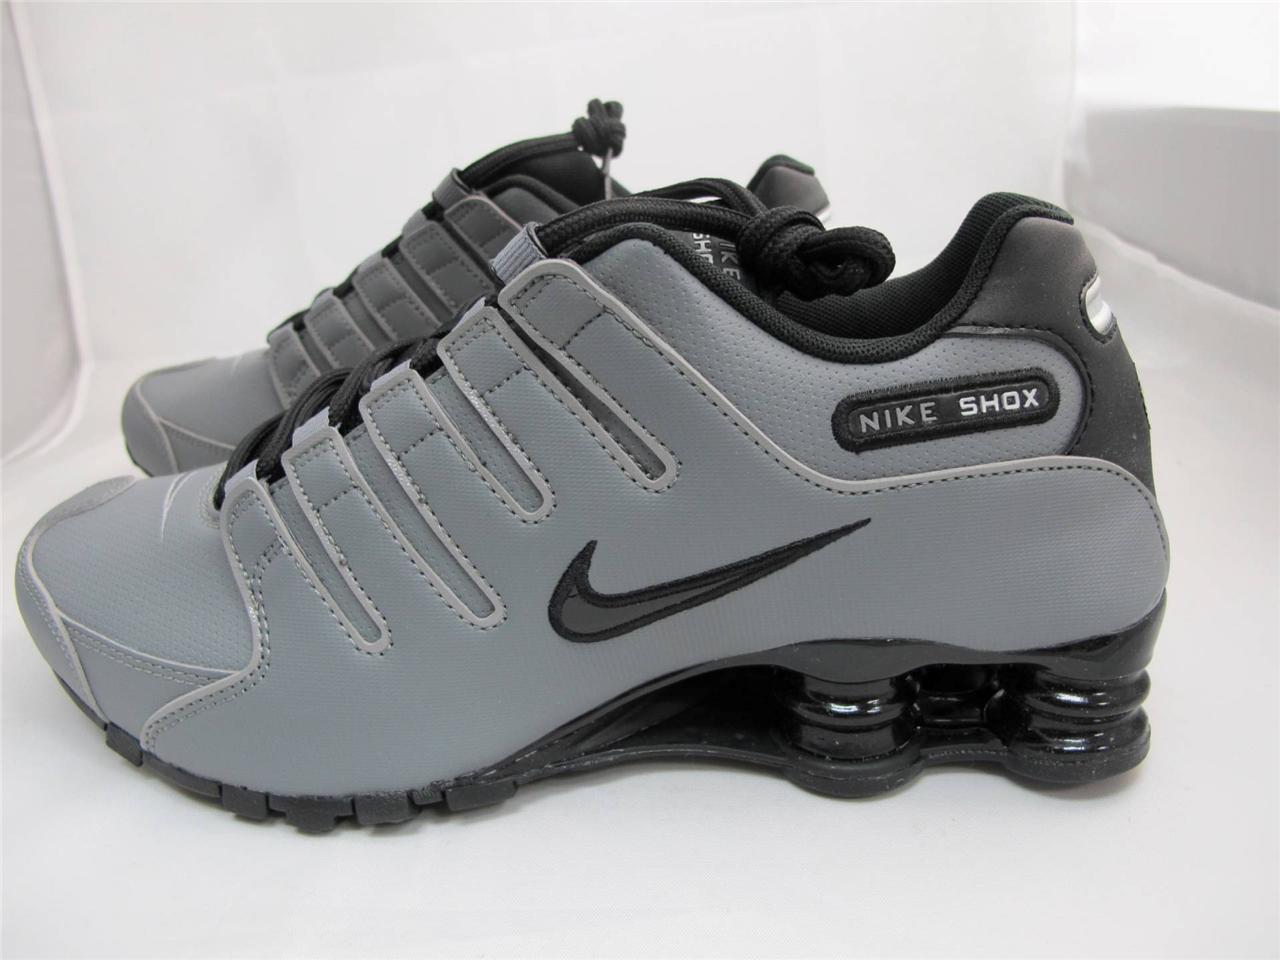 6b0f8921f7594b Grey And Black Nike Shox - Notary Chamber